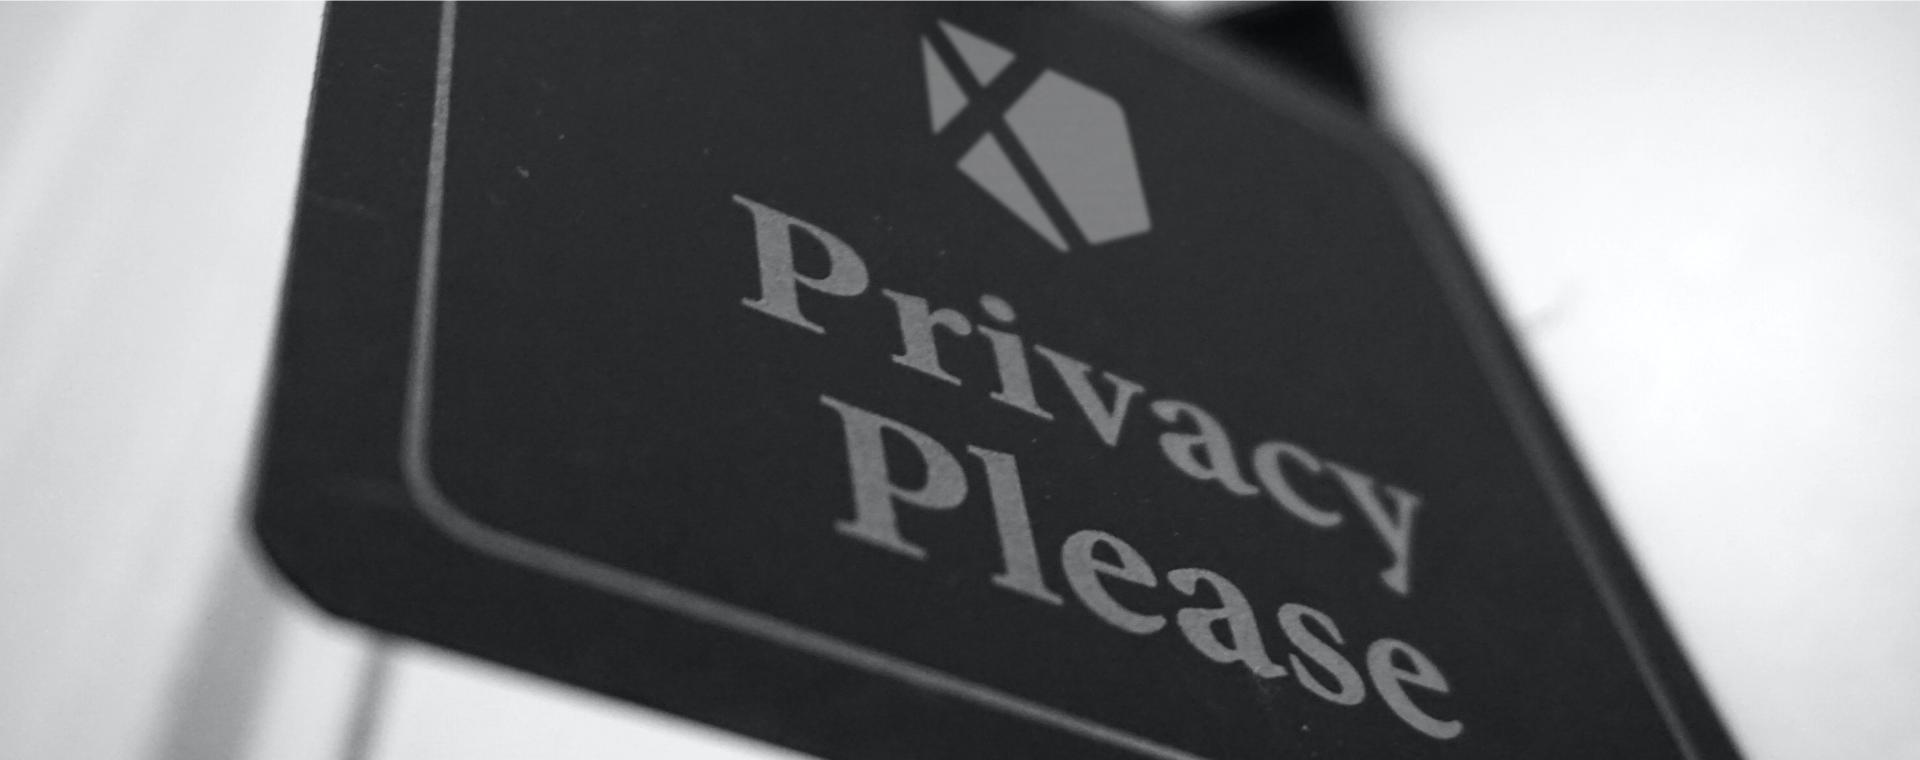 Introducing Privacism